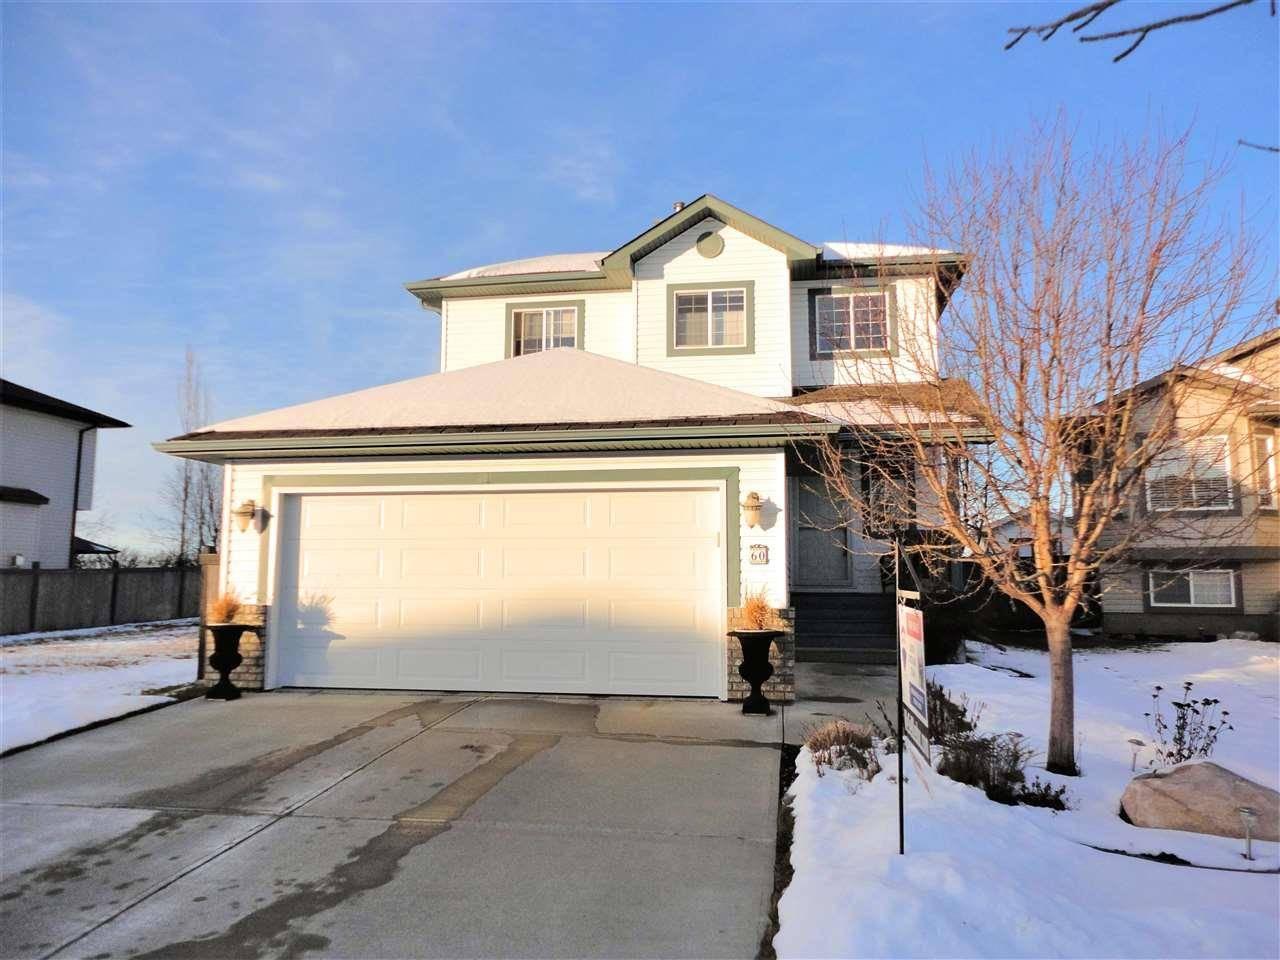 House for sale at 60 Birchmont Cres Leduc Alberta - MLS: E4173263